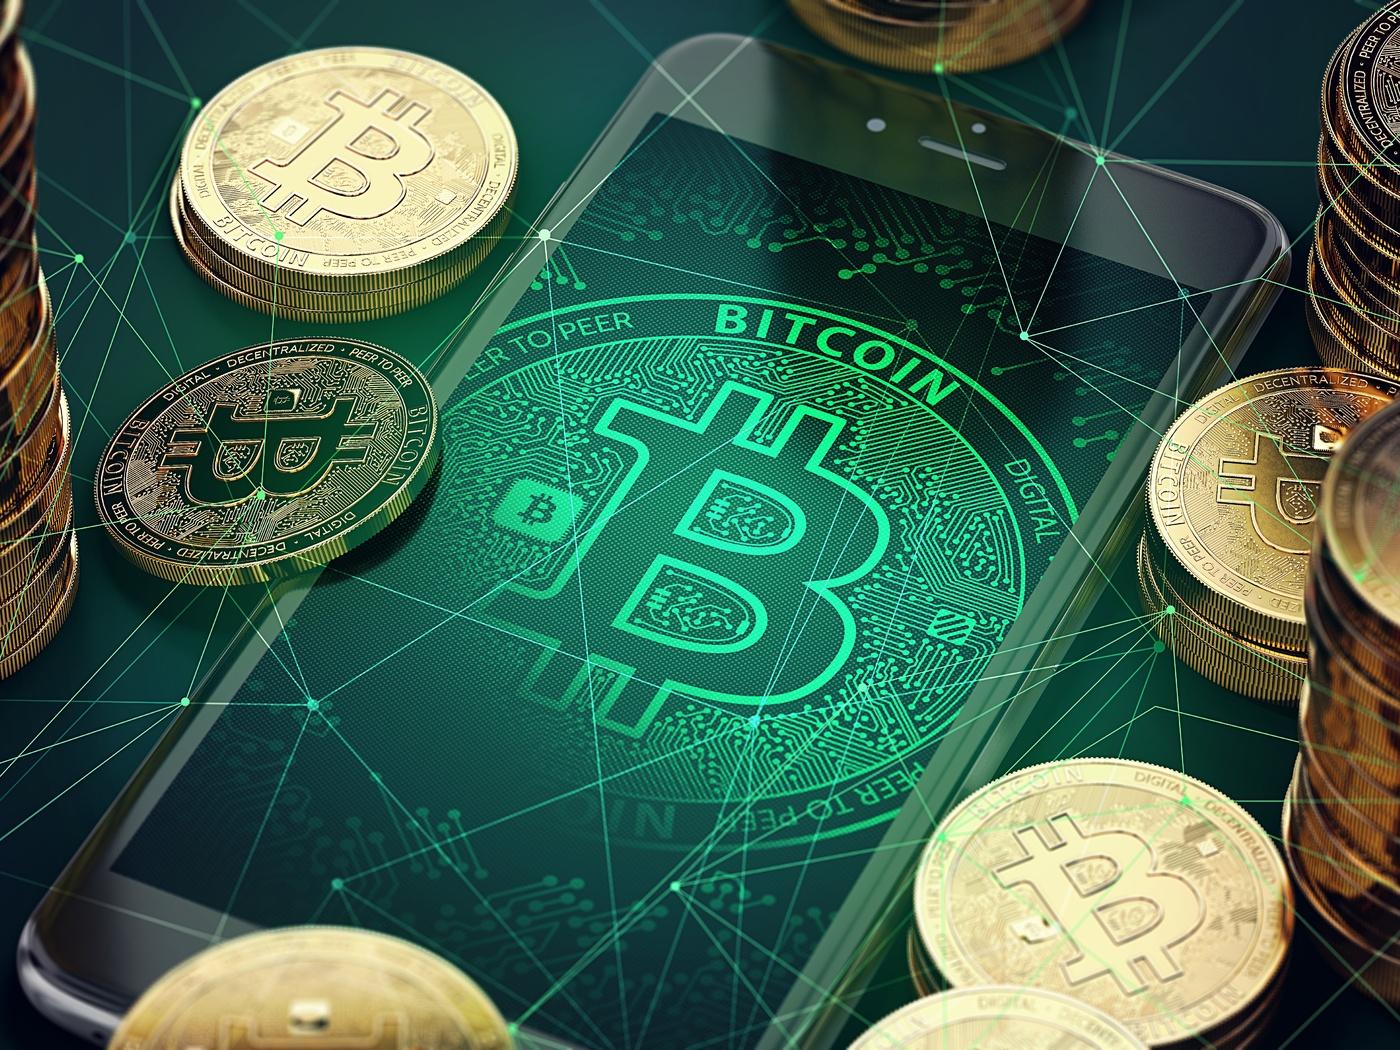 bitcoin-cryptocurrency-digital-currency-5k-cj.jpg